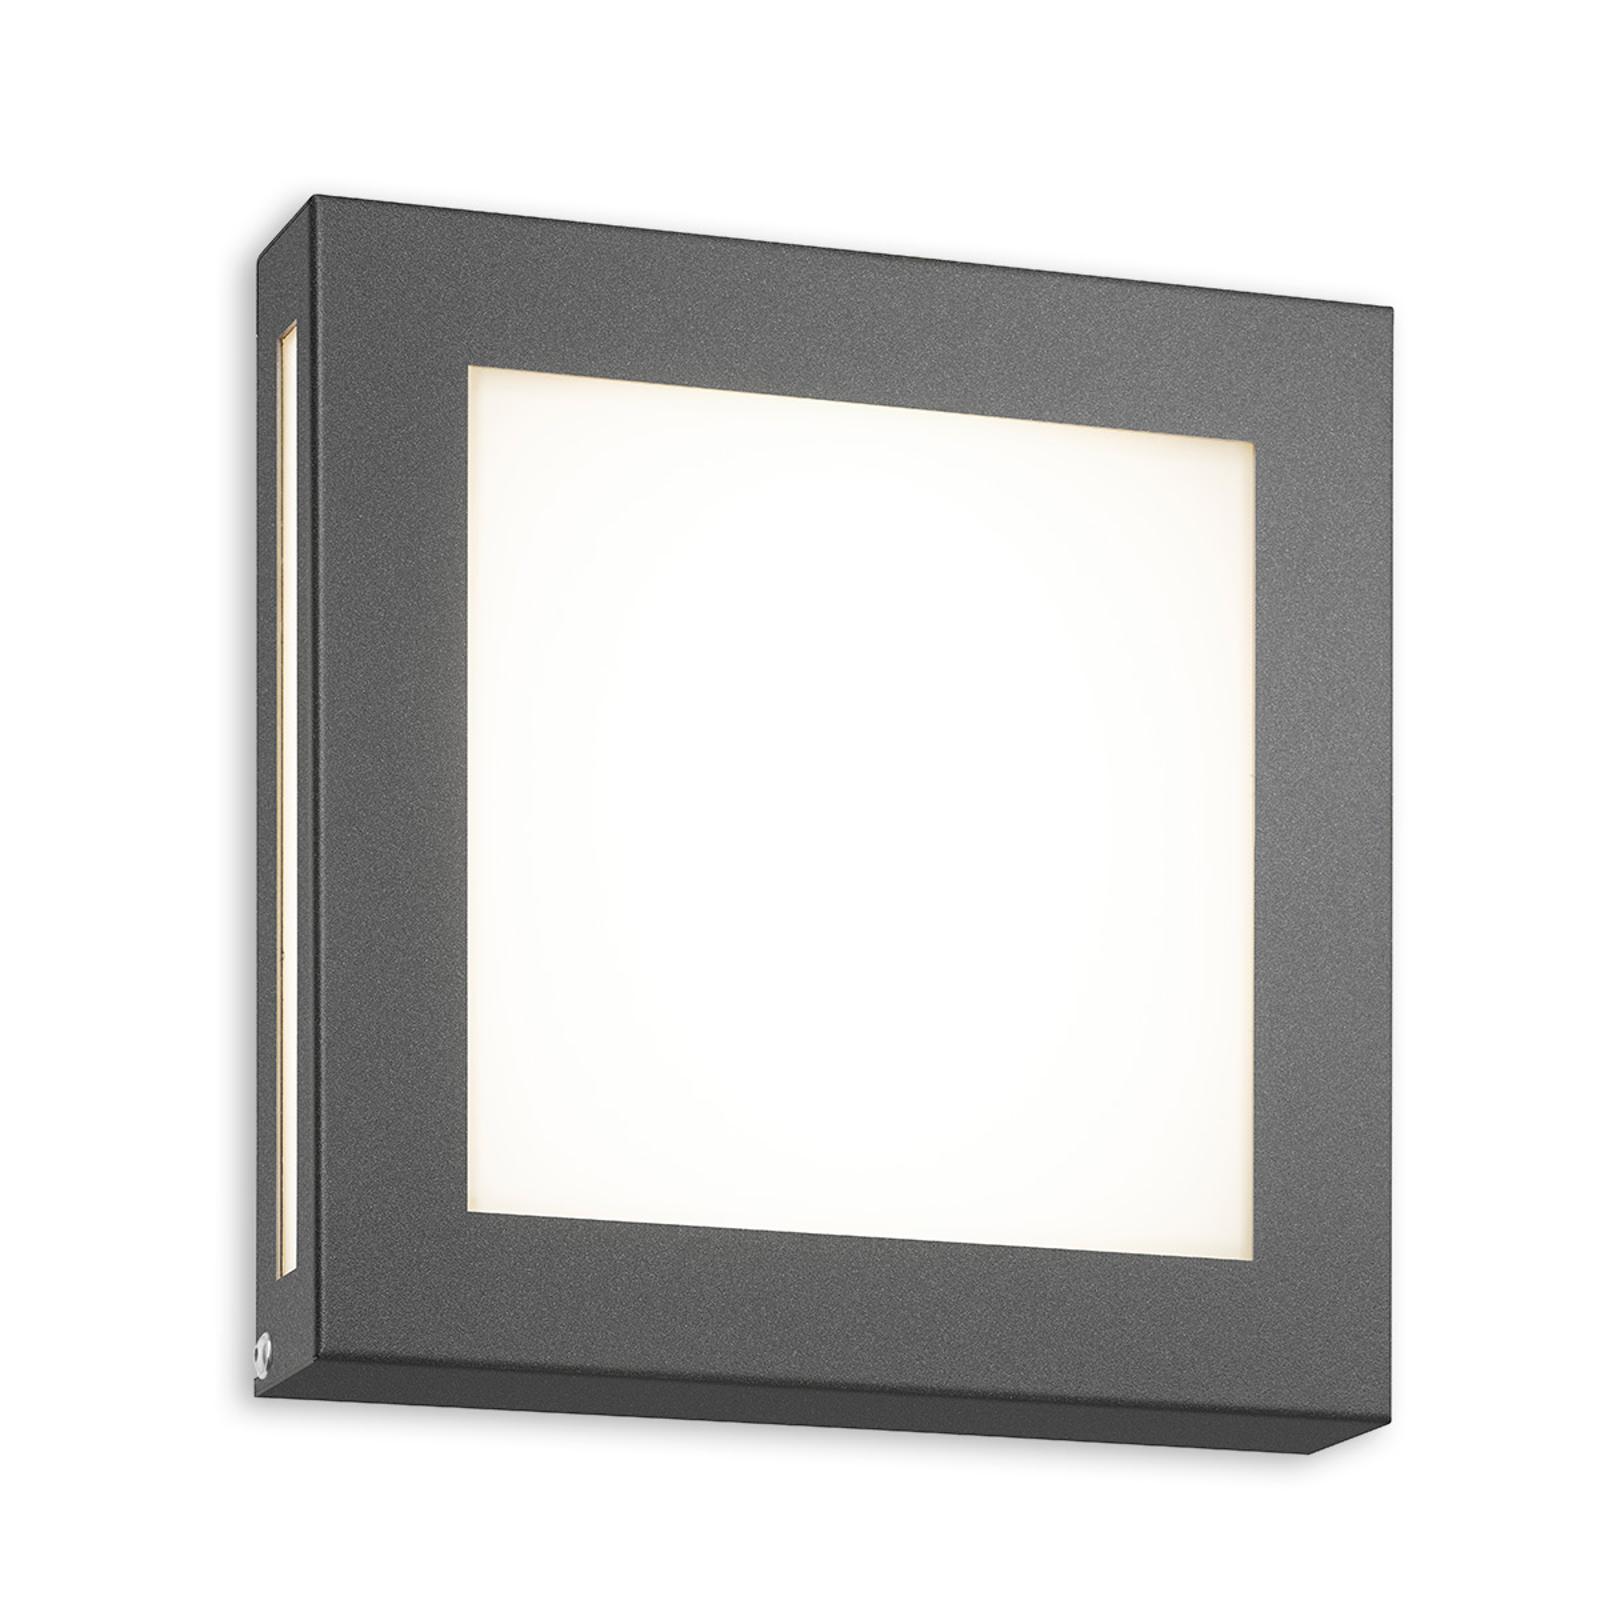 Aplique LED color antracita pared ext Legendo Mini